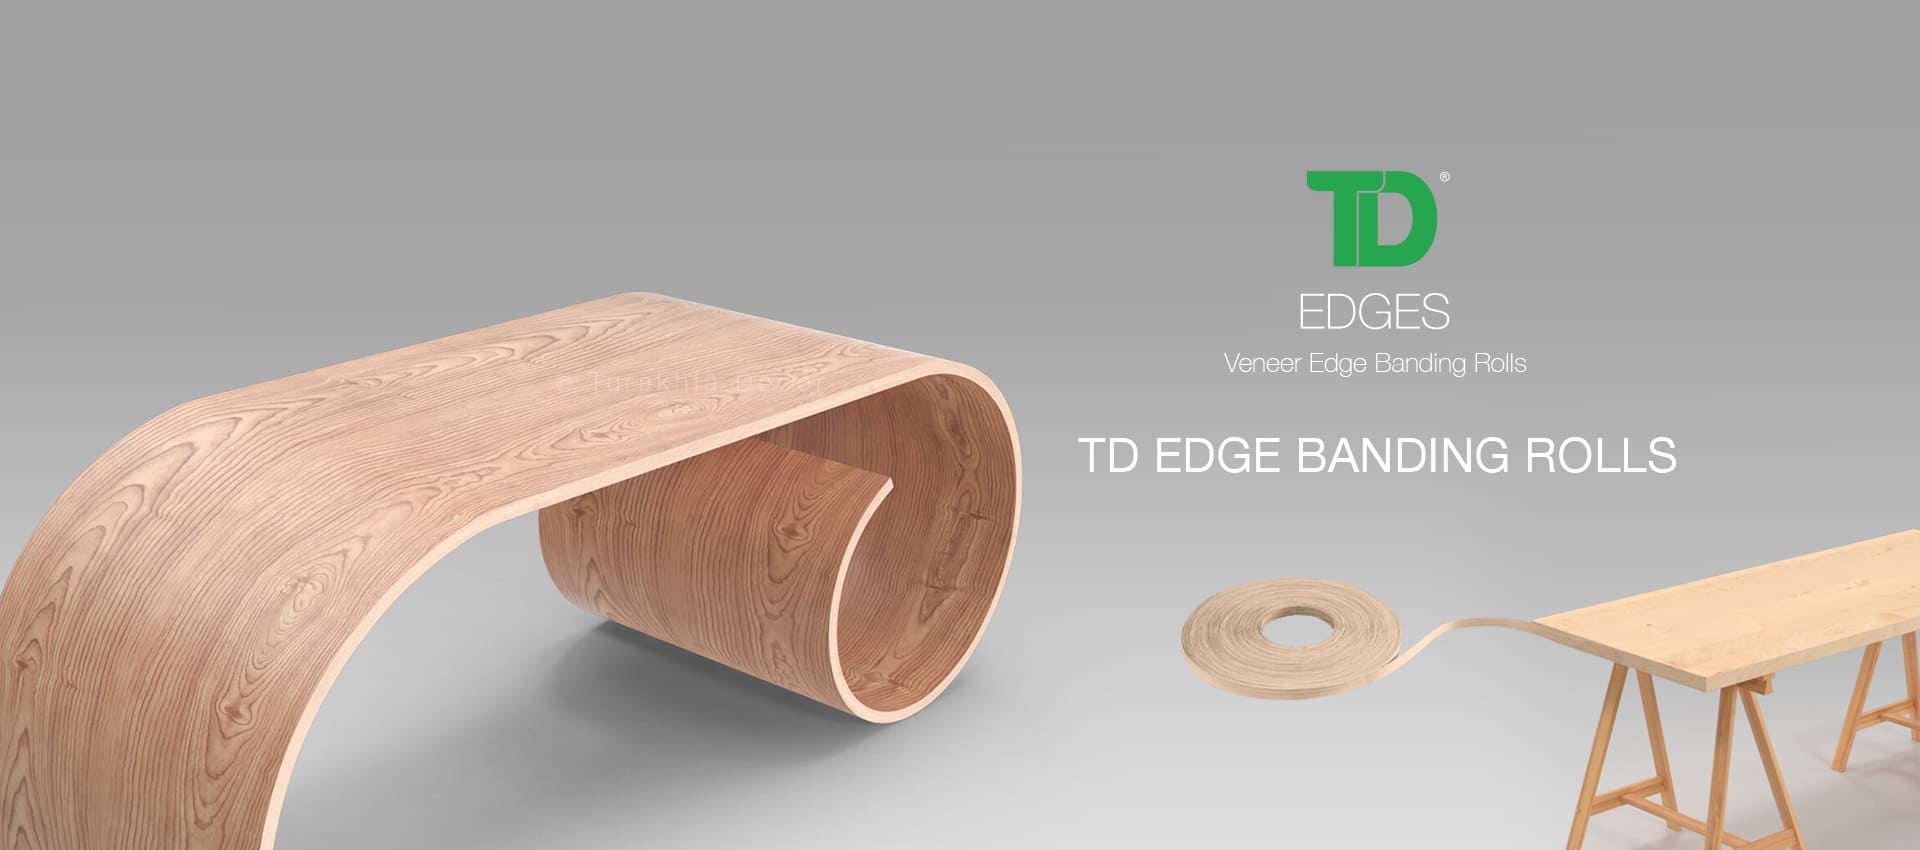 TD Edge